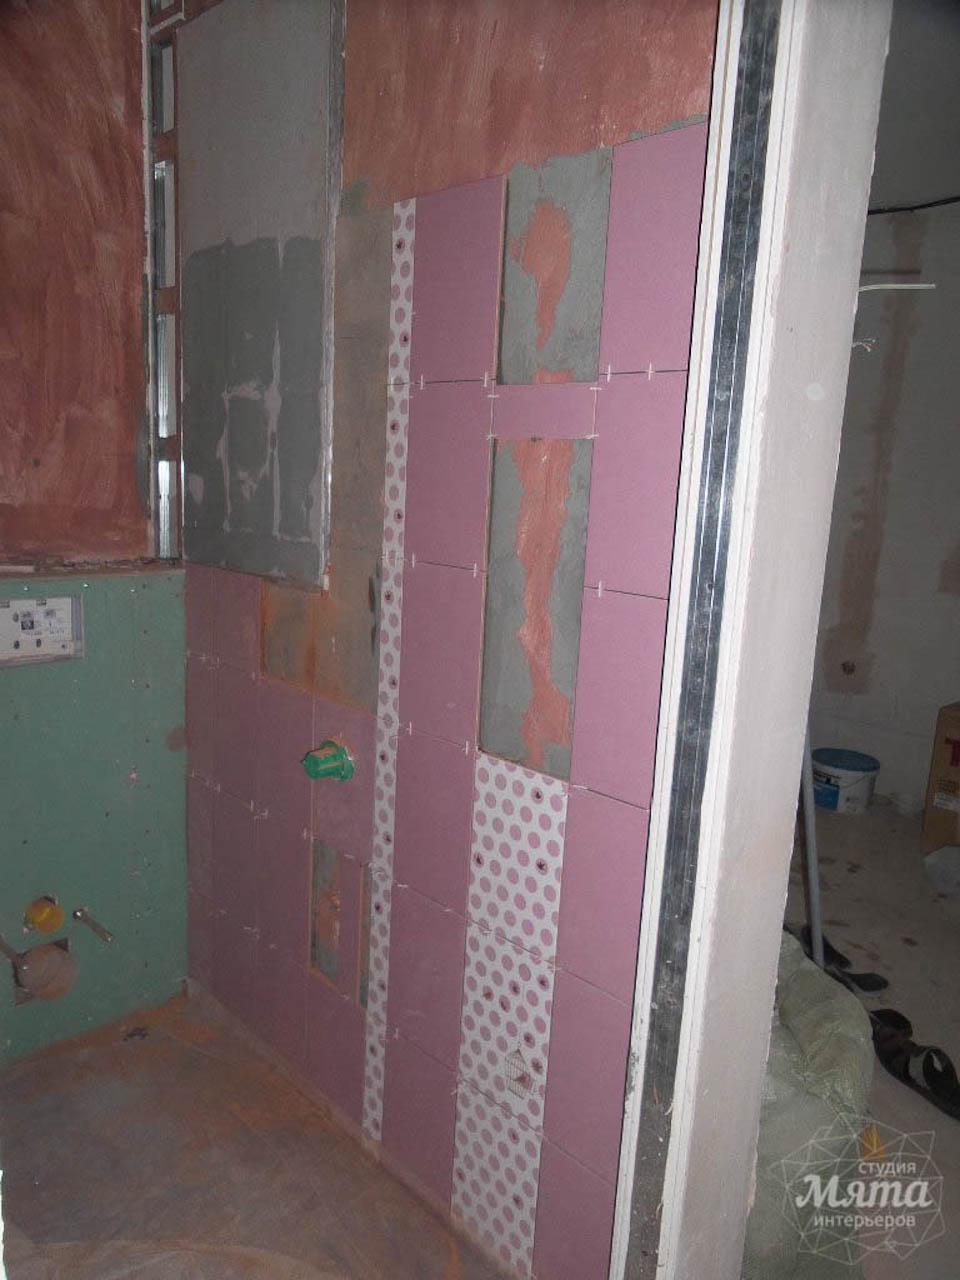 Дизайн интерьера и ремонт трехкомнатной квартиры по ул. Фучика 9 19